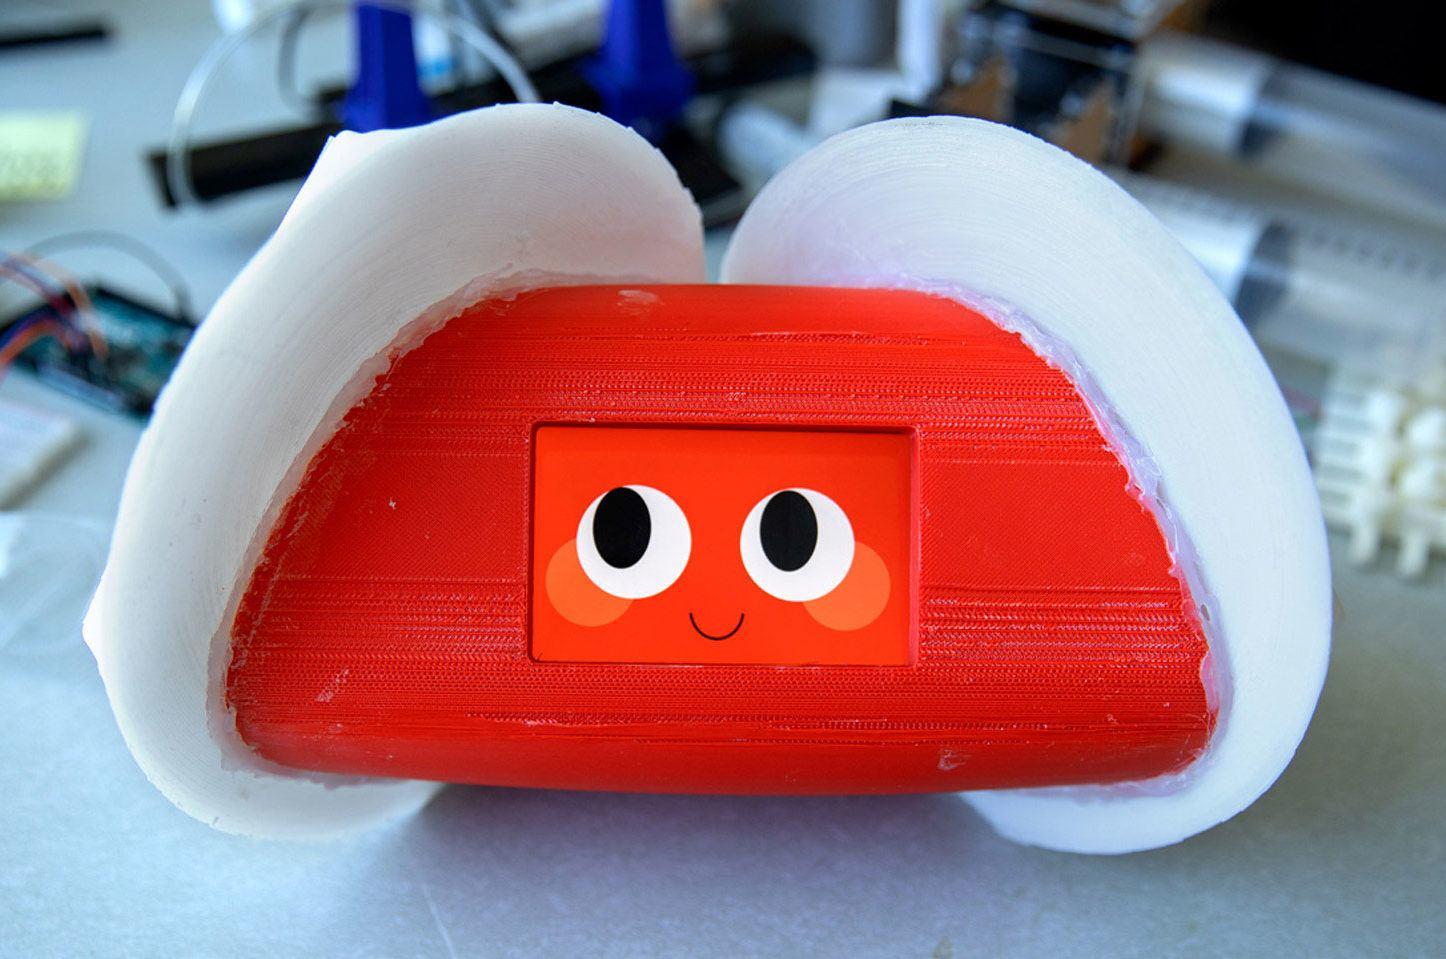 Human-Robot Collaboration and Companionship Lab's interactive robot